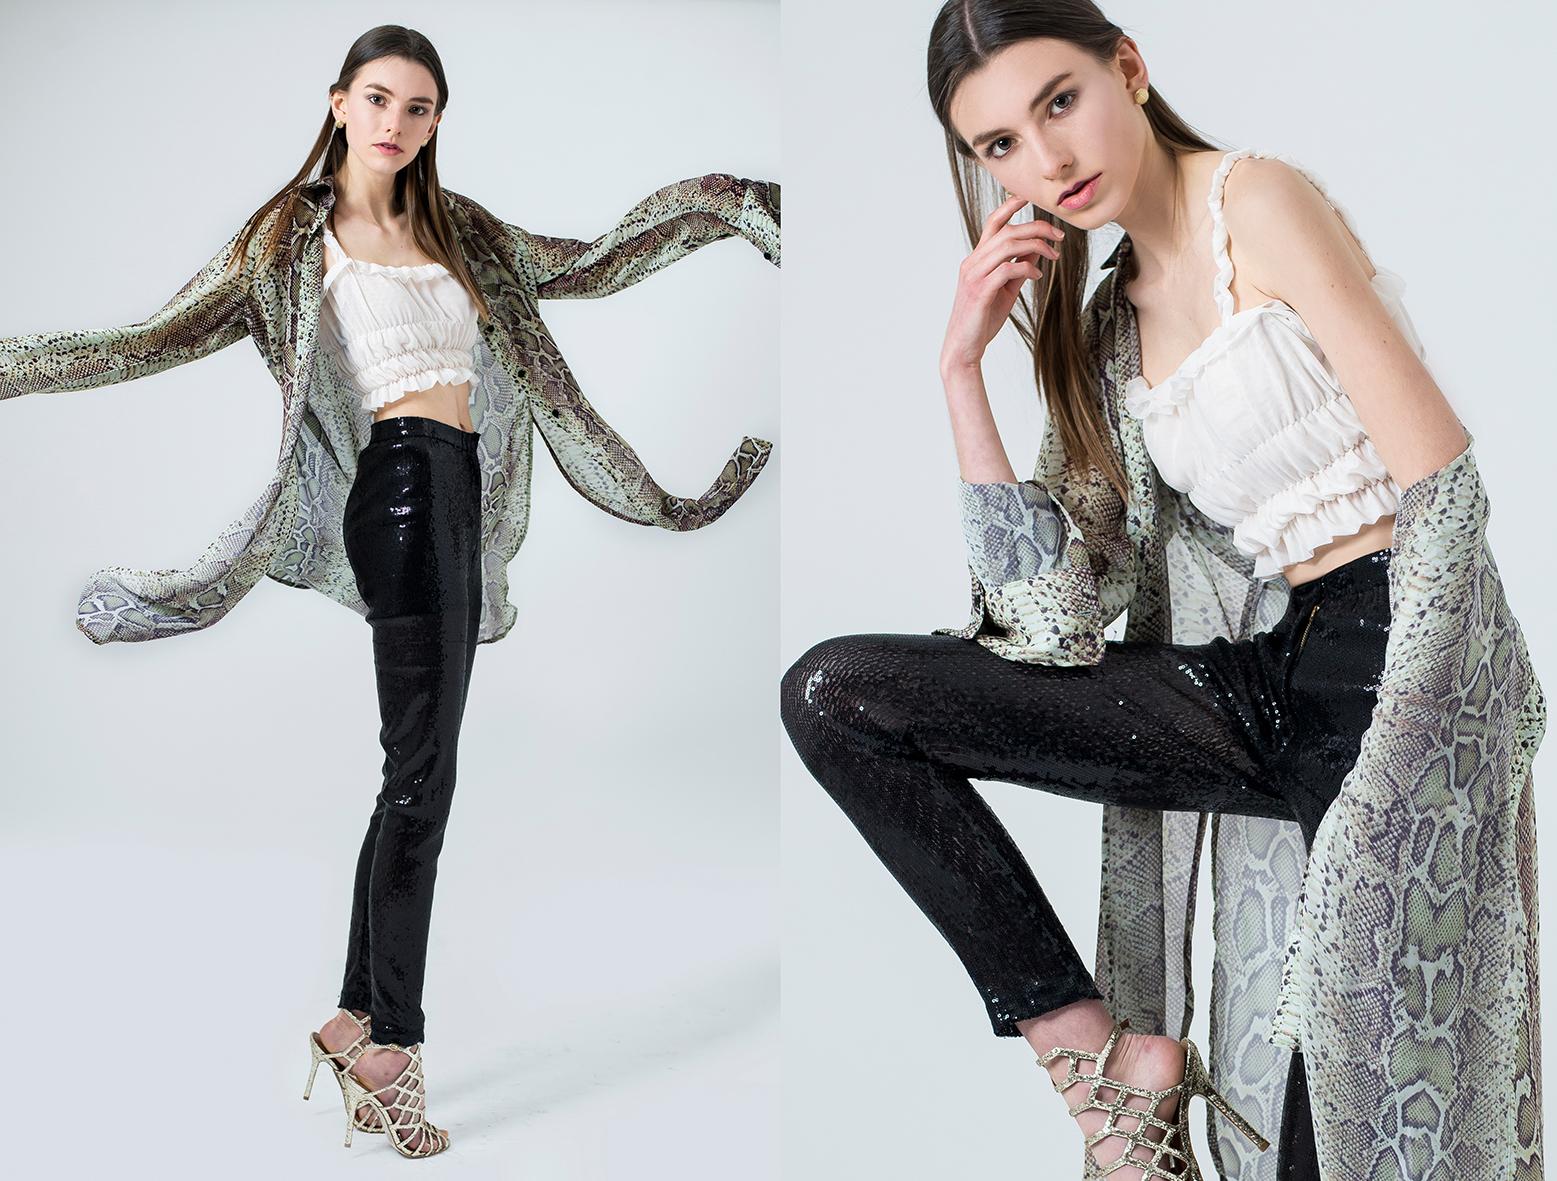 Top , DHOSIS.  Blusa print de serpiente , VON KOLLMANN.  Pantalón de lentejuelas , WEAR IT B#TCH.  Zapatos , STEVE MADDEN.  Aretes,  VINTAGE.